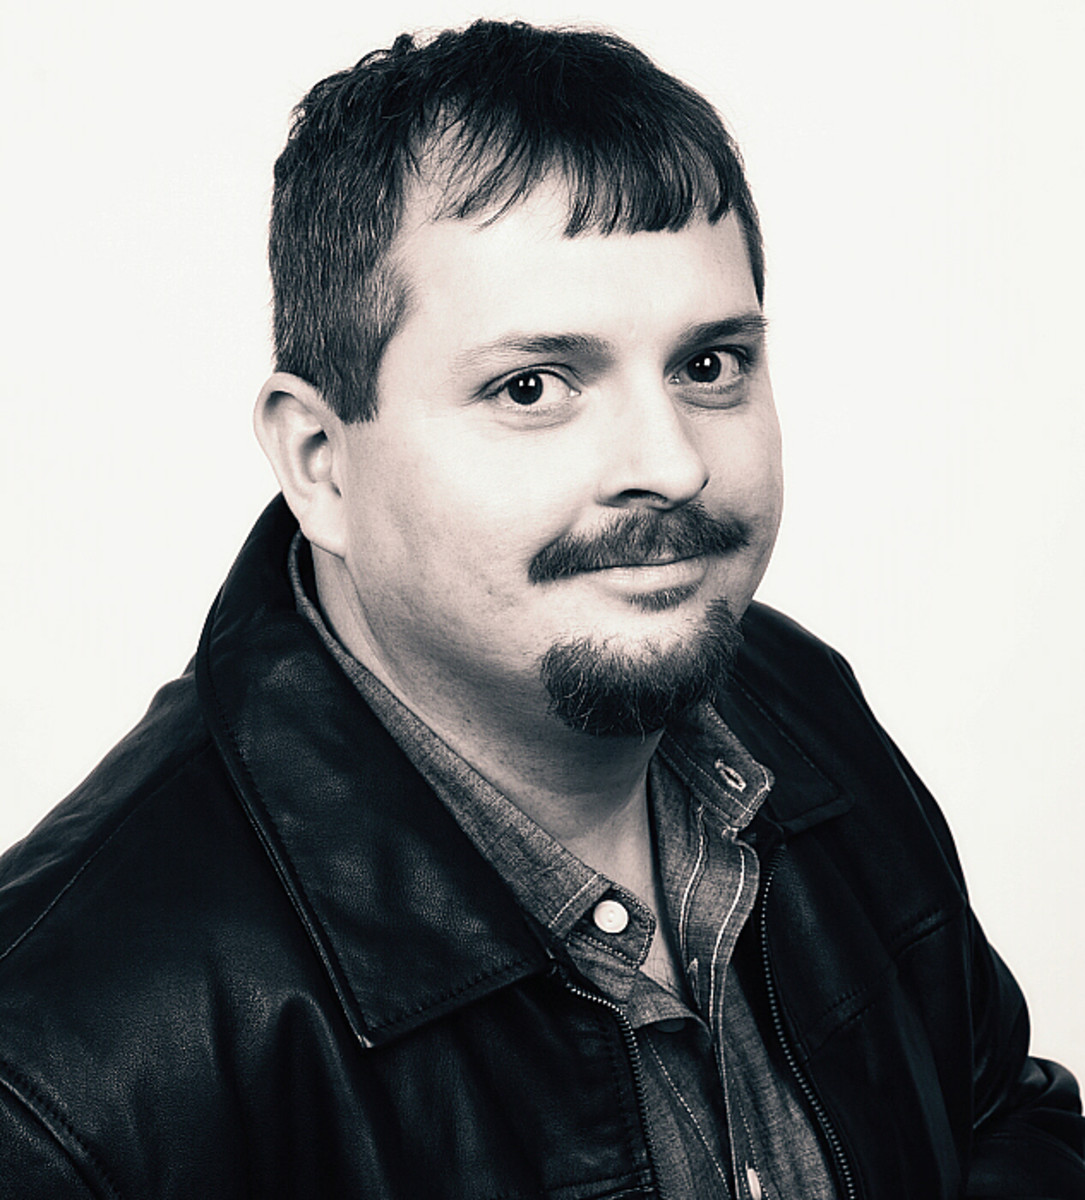 Tony-Peak-author-writer